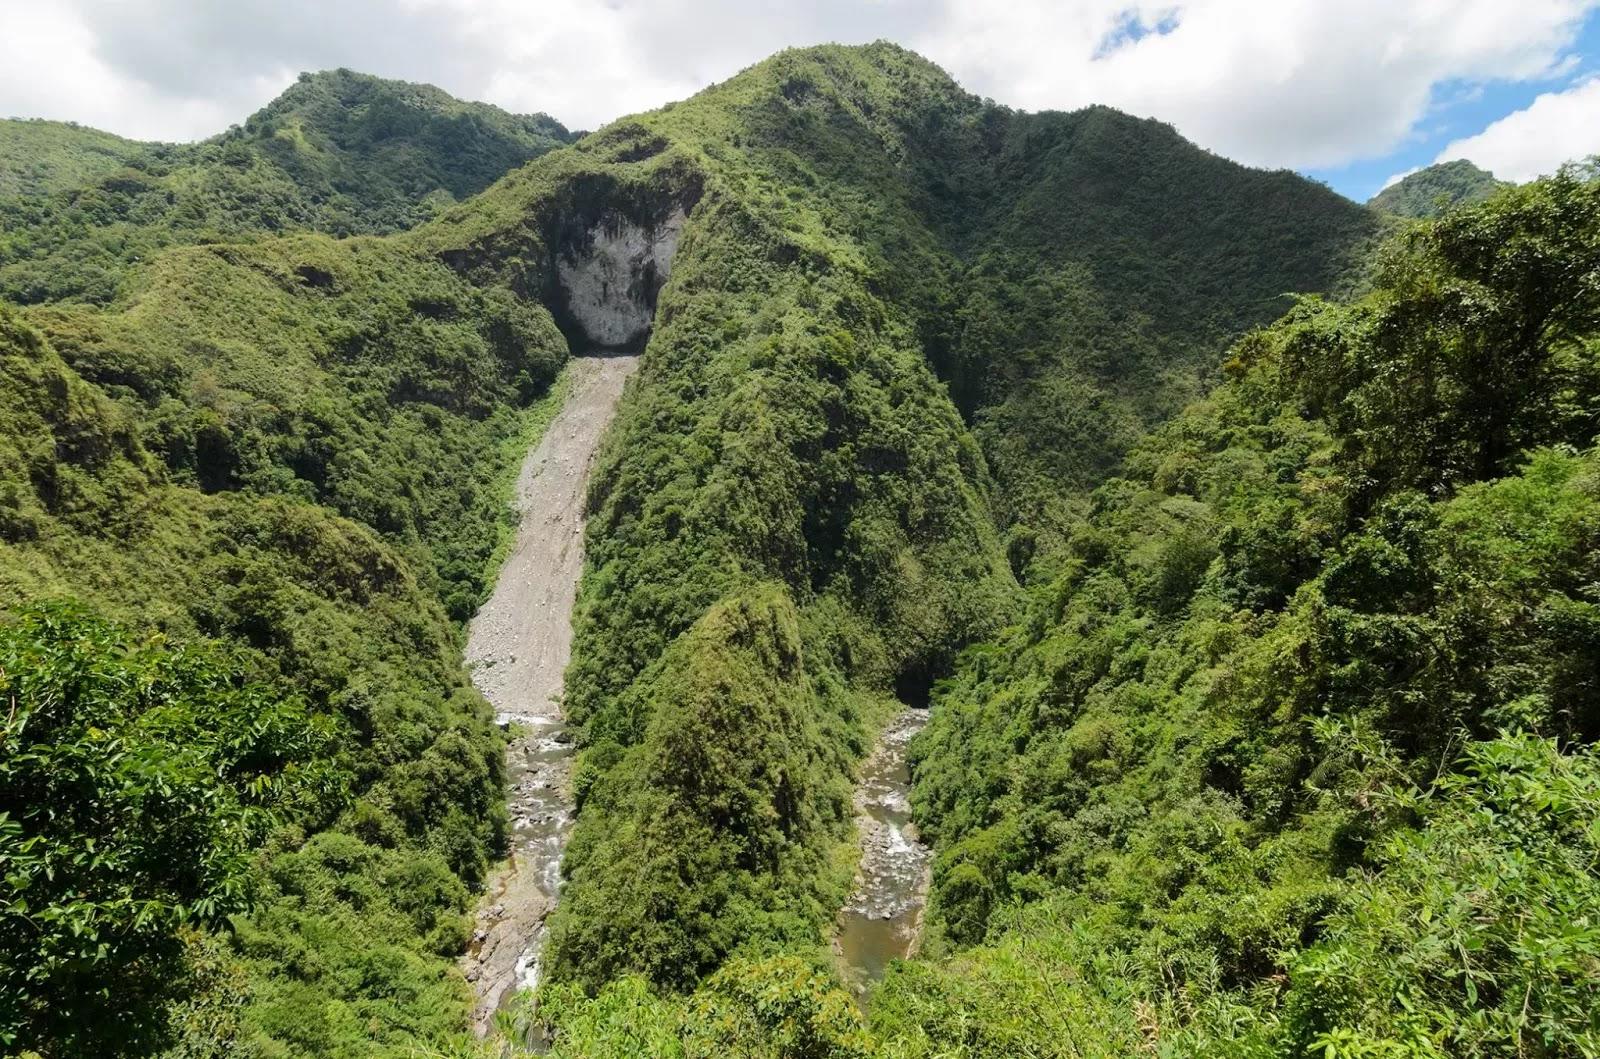 Tappiyah Sidescene Landscapes Batad Ifugao Cordillera Administrative Region Philippines